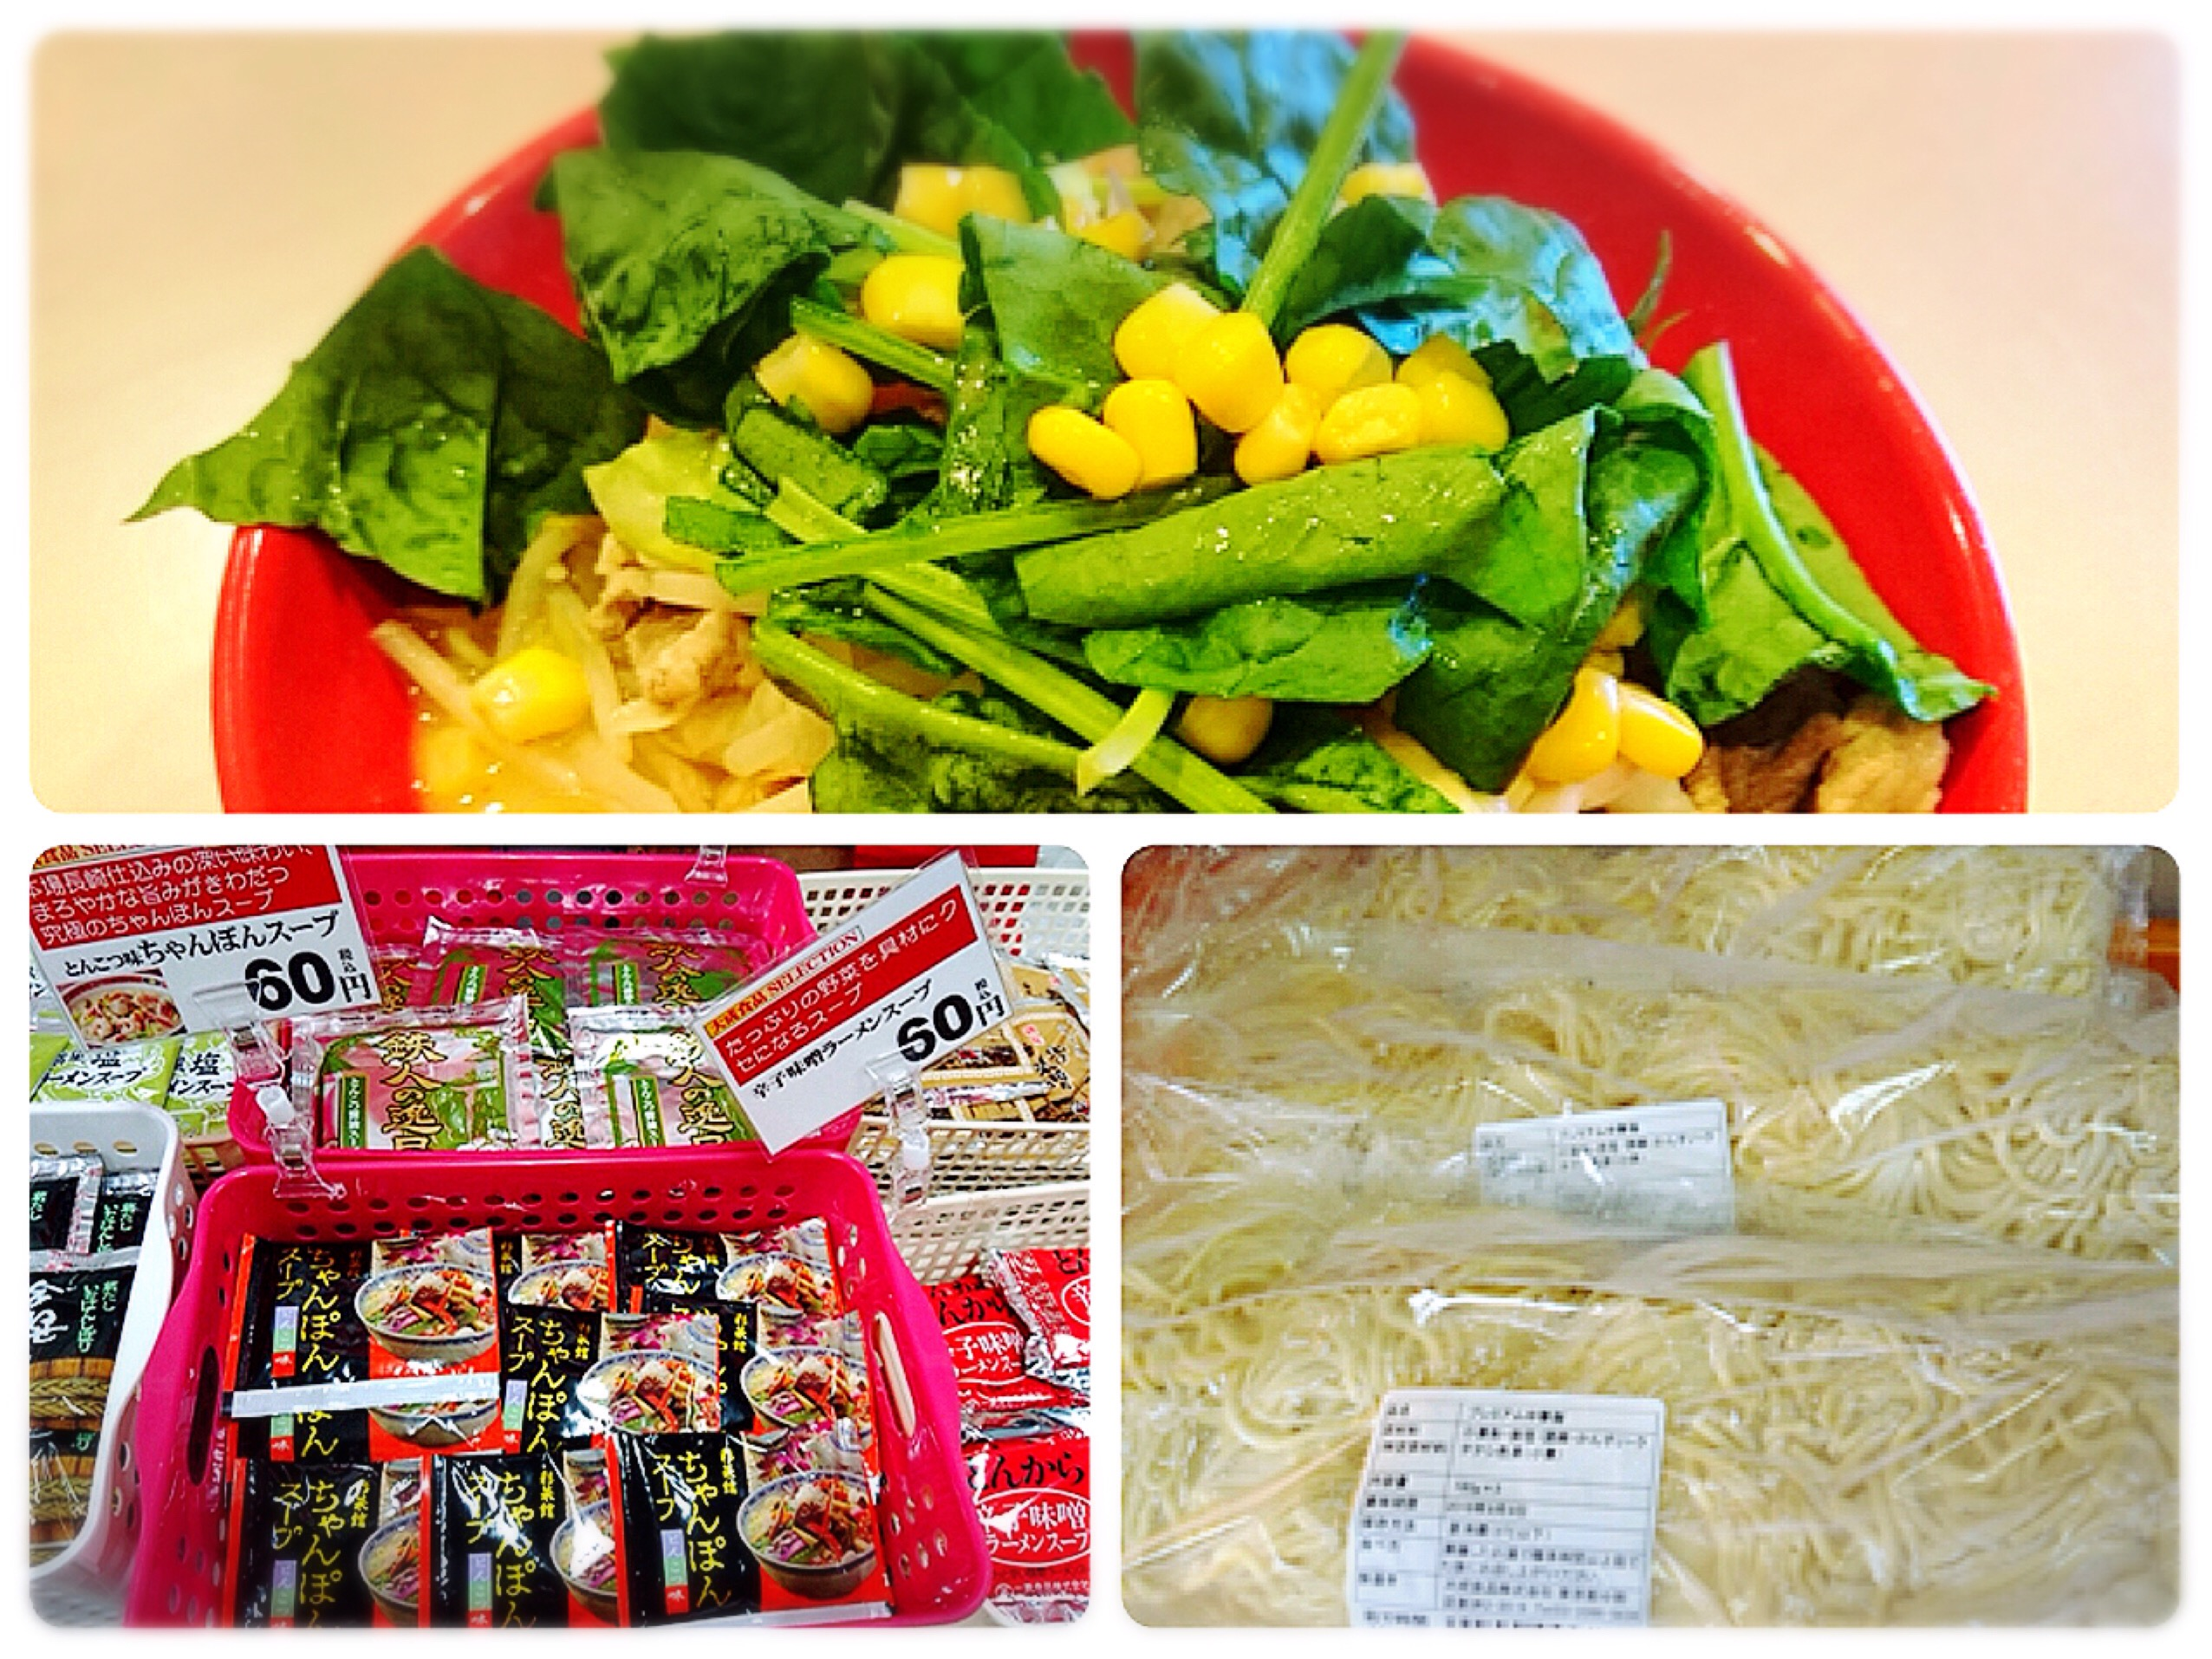 大成麺市場ちゃんぽん@東京都中野区新井2−20−9 大成食品株式会社工場直売